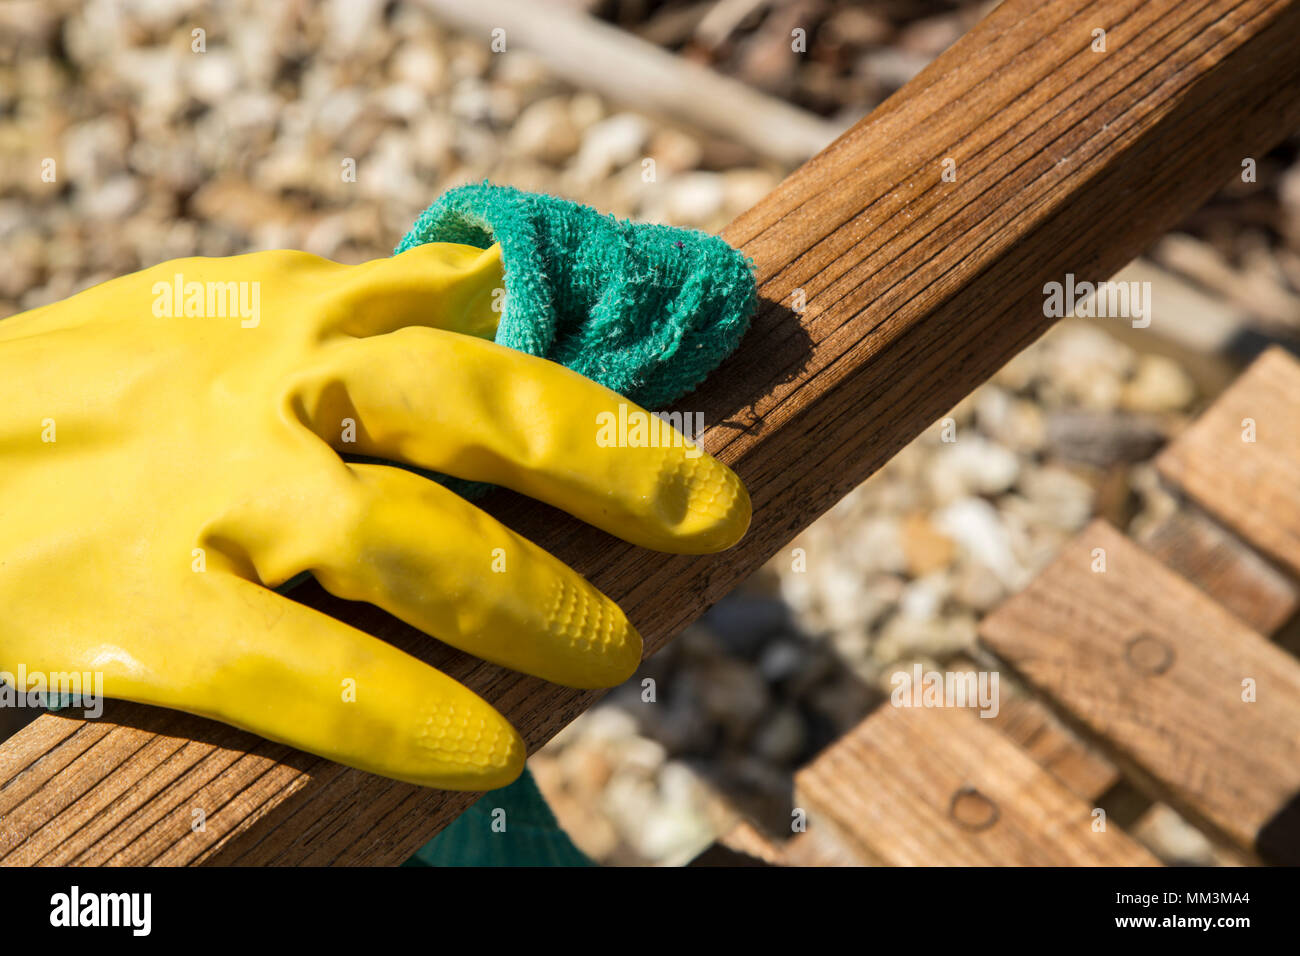 Applying Teak Oil As A Preservative To A Teak Garden Bench Using